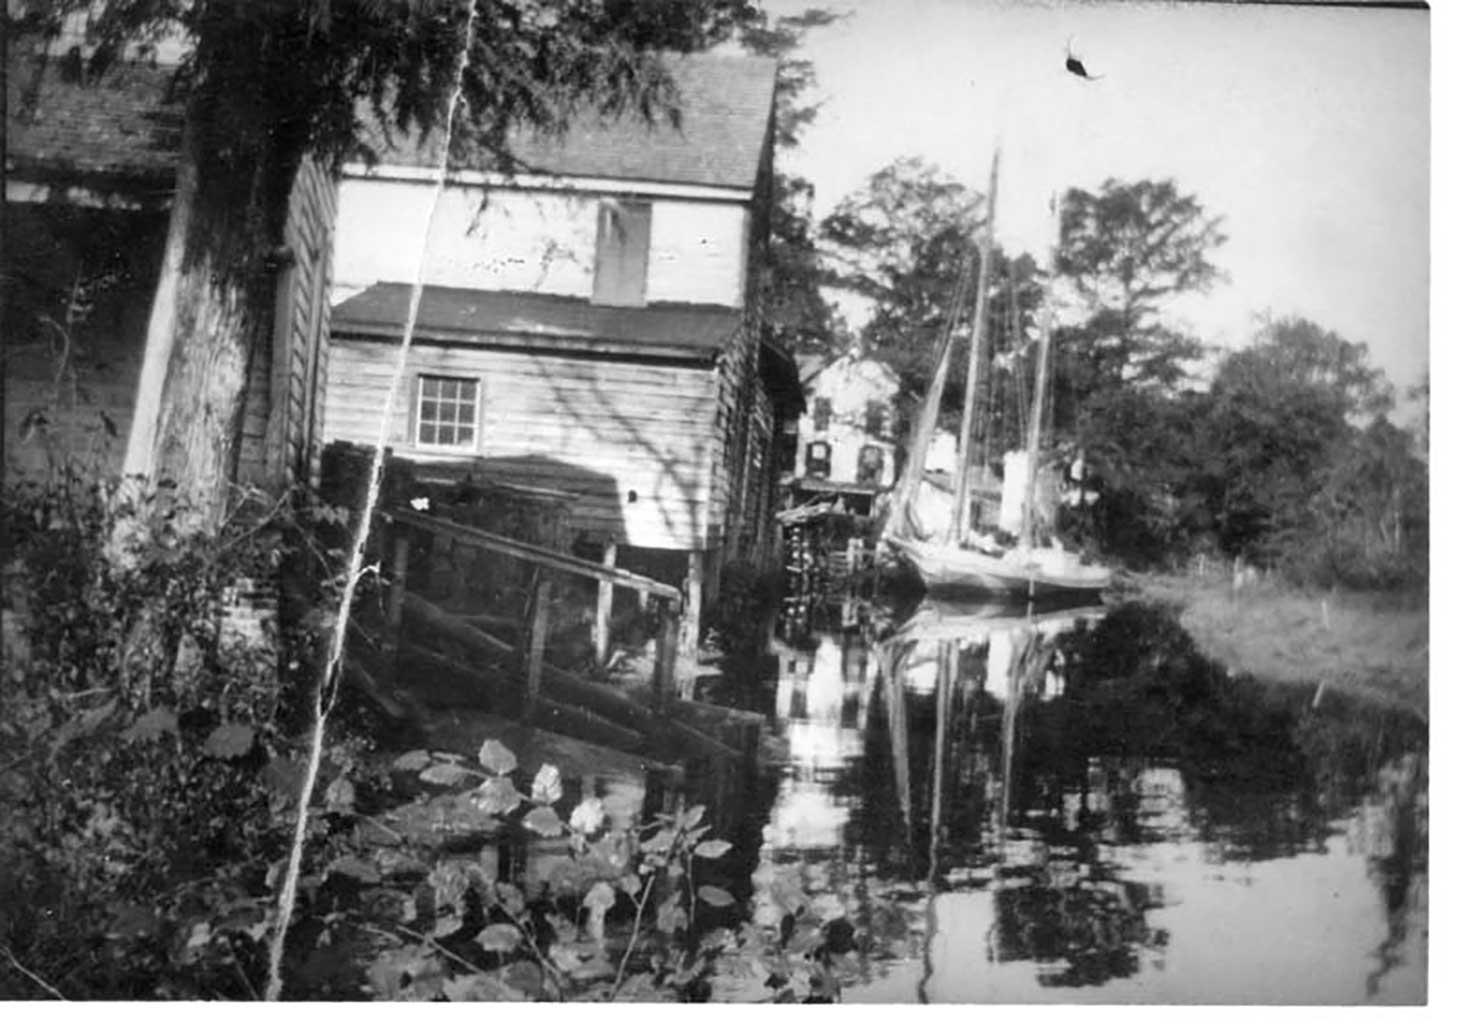 everets-warehouses-wagner-home-everets-creek-c-1914-img205